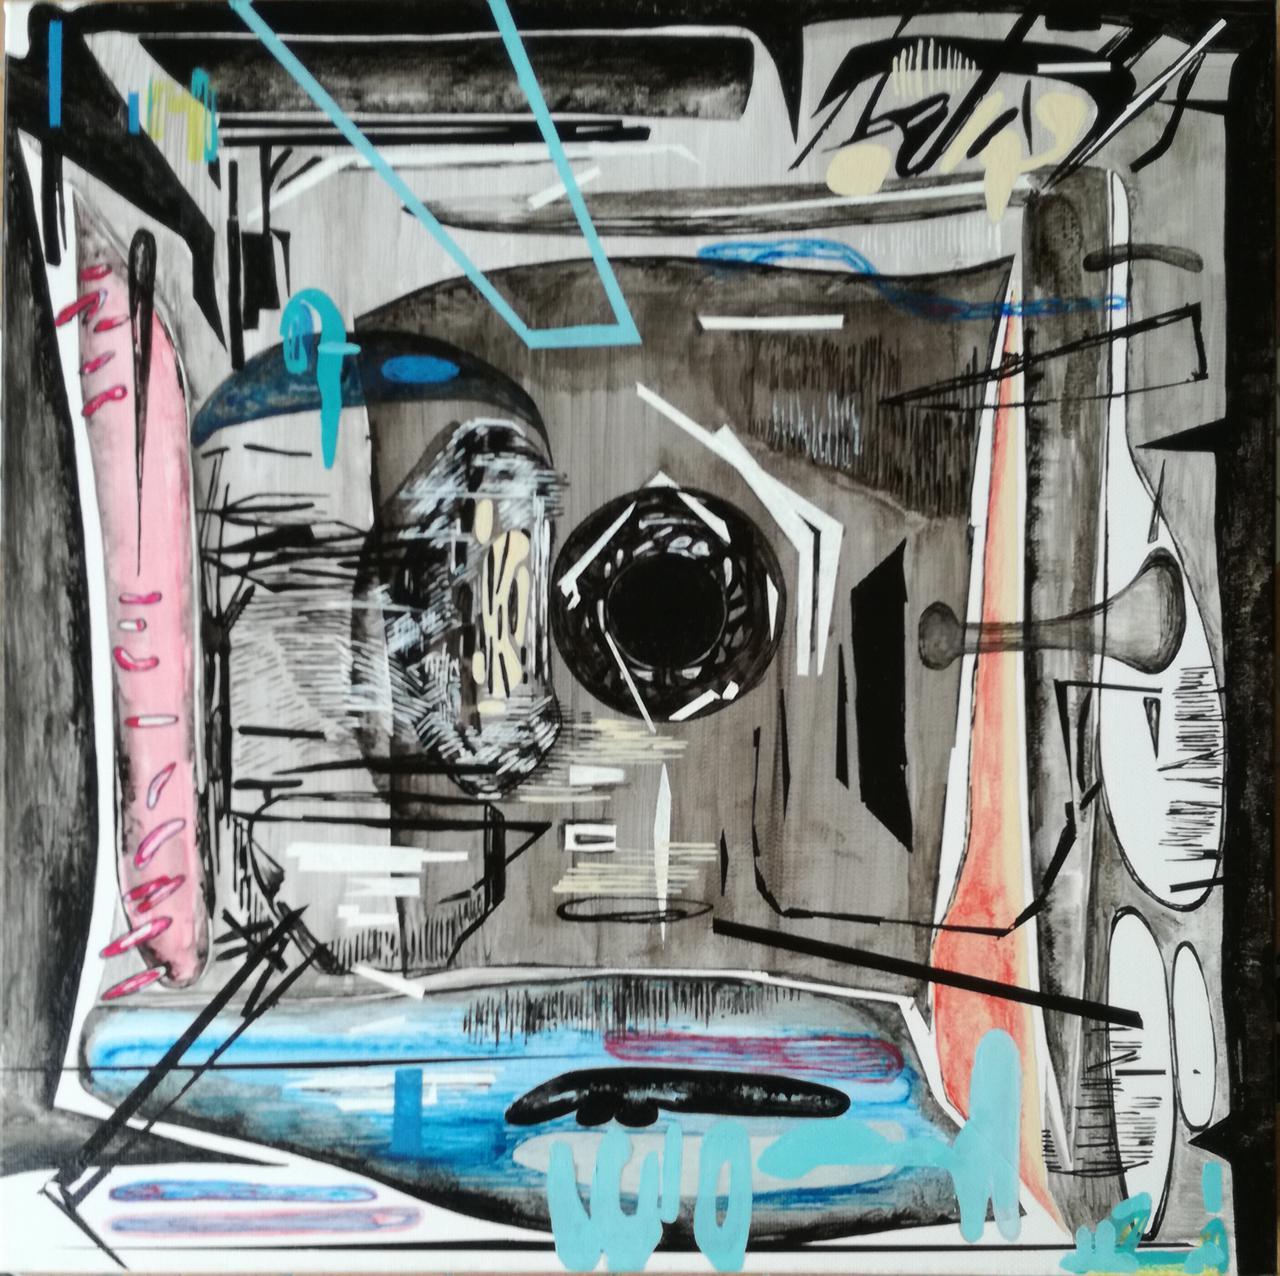 Vana Fertaki, Space, 40 x 40 cm, varnish and oil on canvas